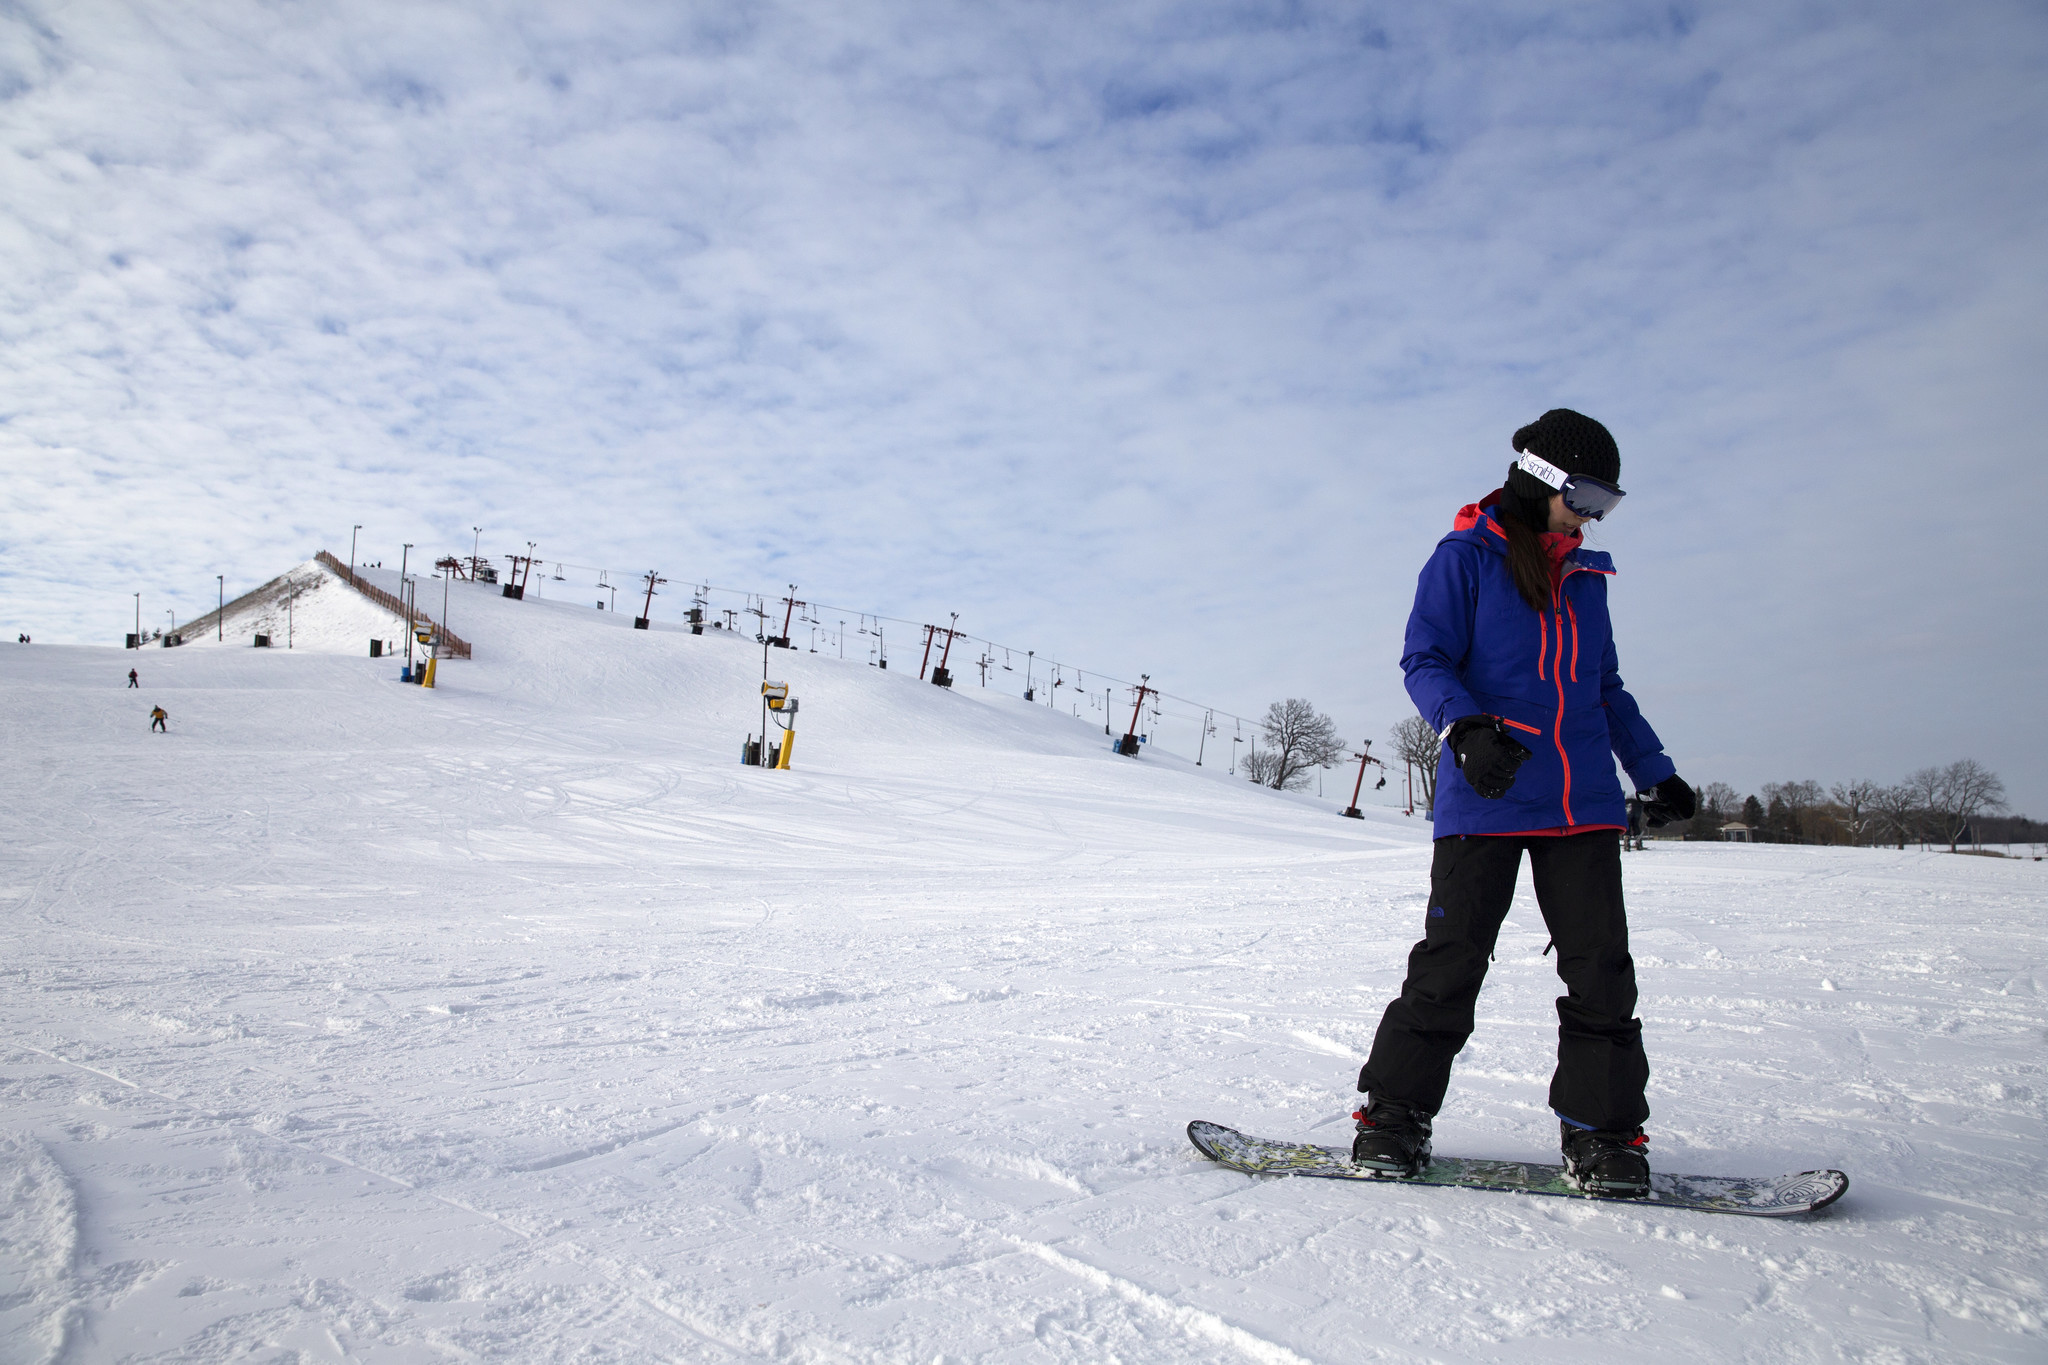 Colorado Mountain School >> New and improved Wilmot Mountain to open Wednesday - Chicago Tribune